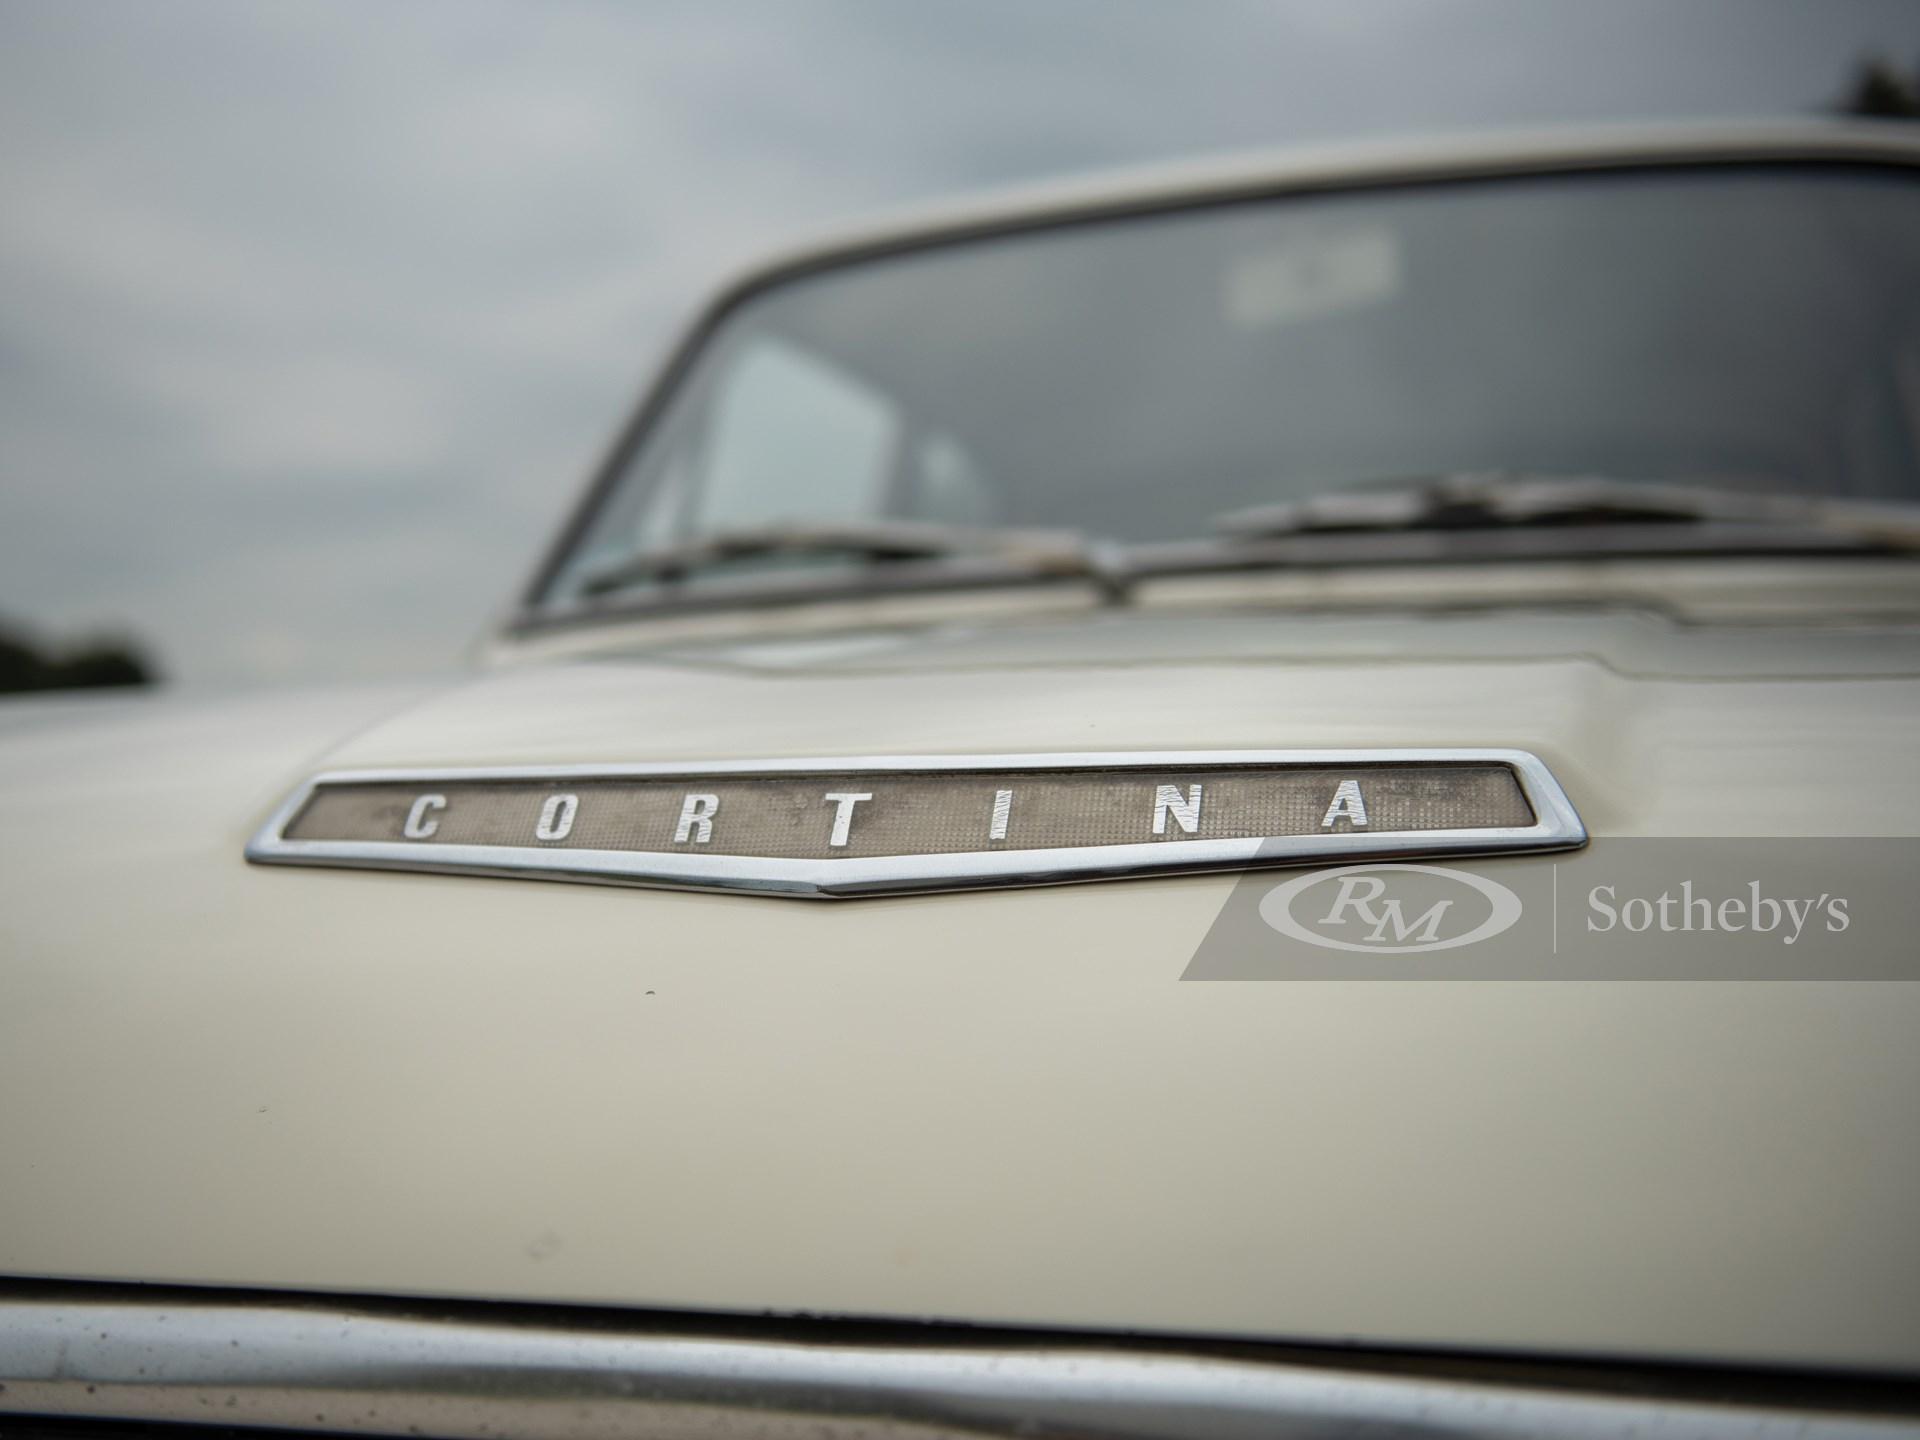 1967 Ford Cortina Lotus Mk 1 Two-Door Saloon  -